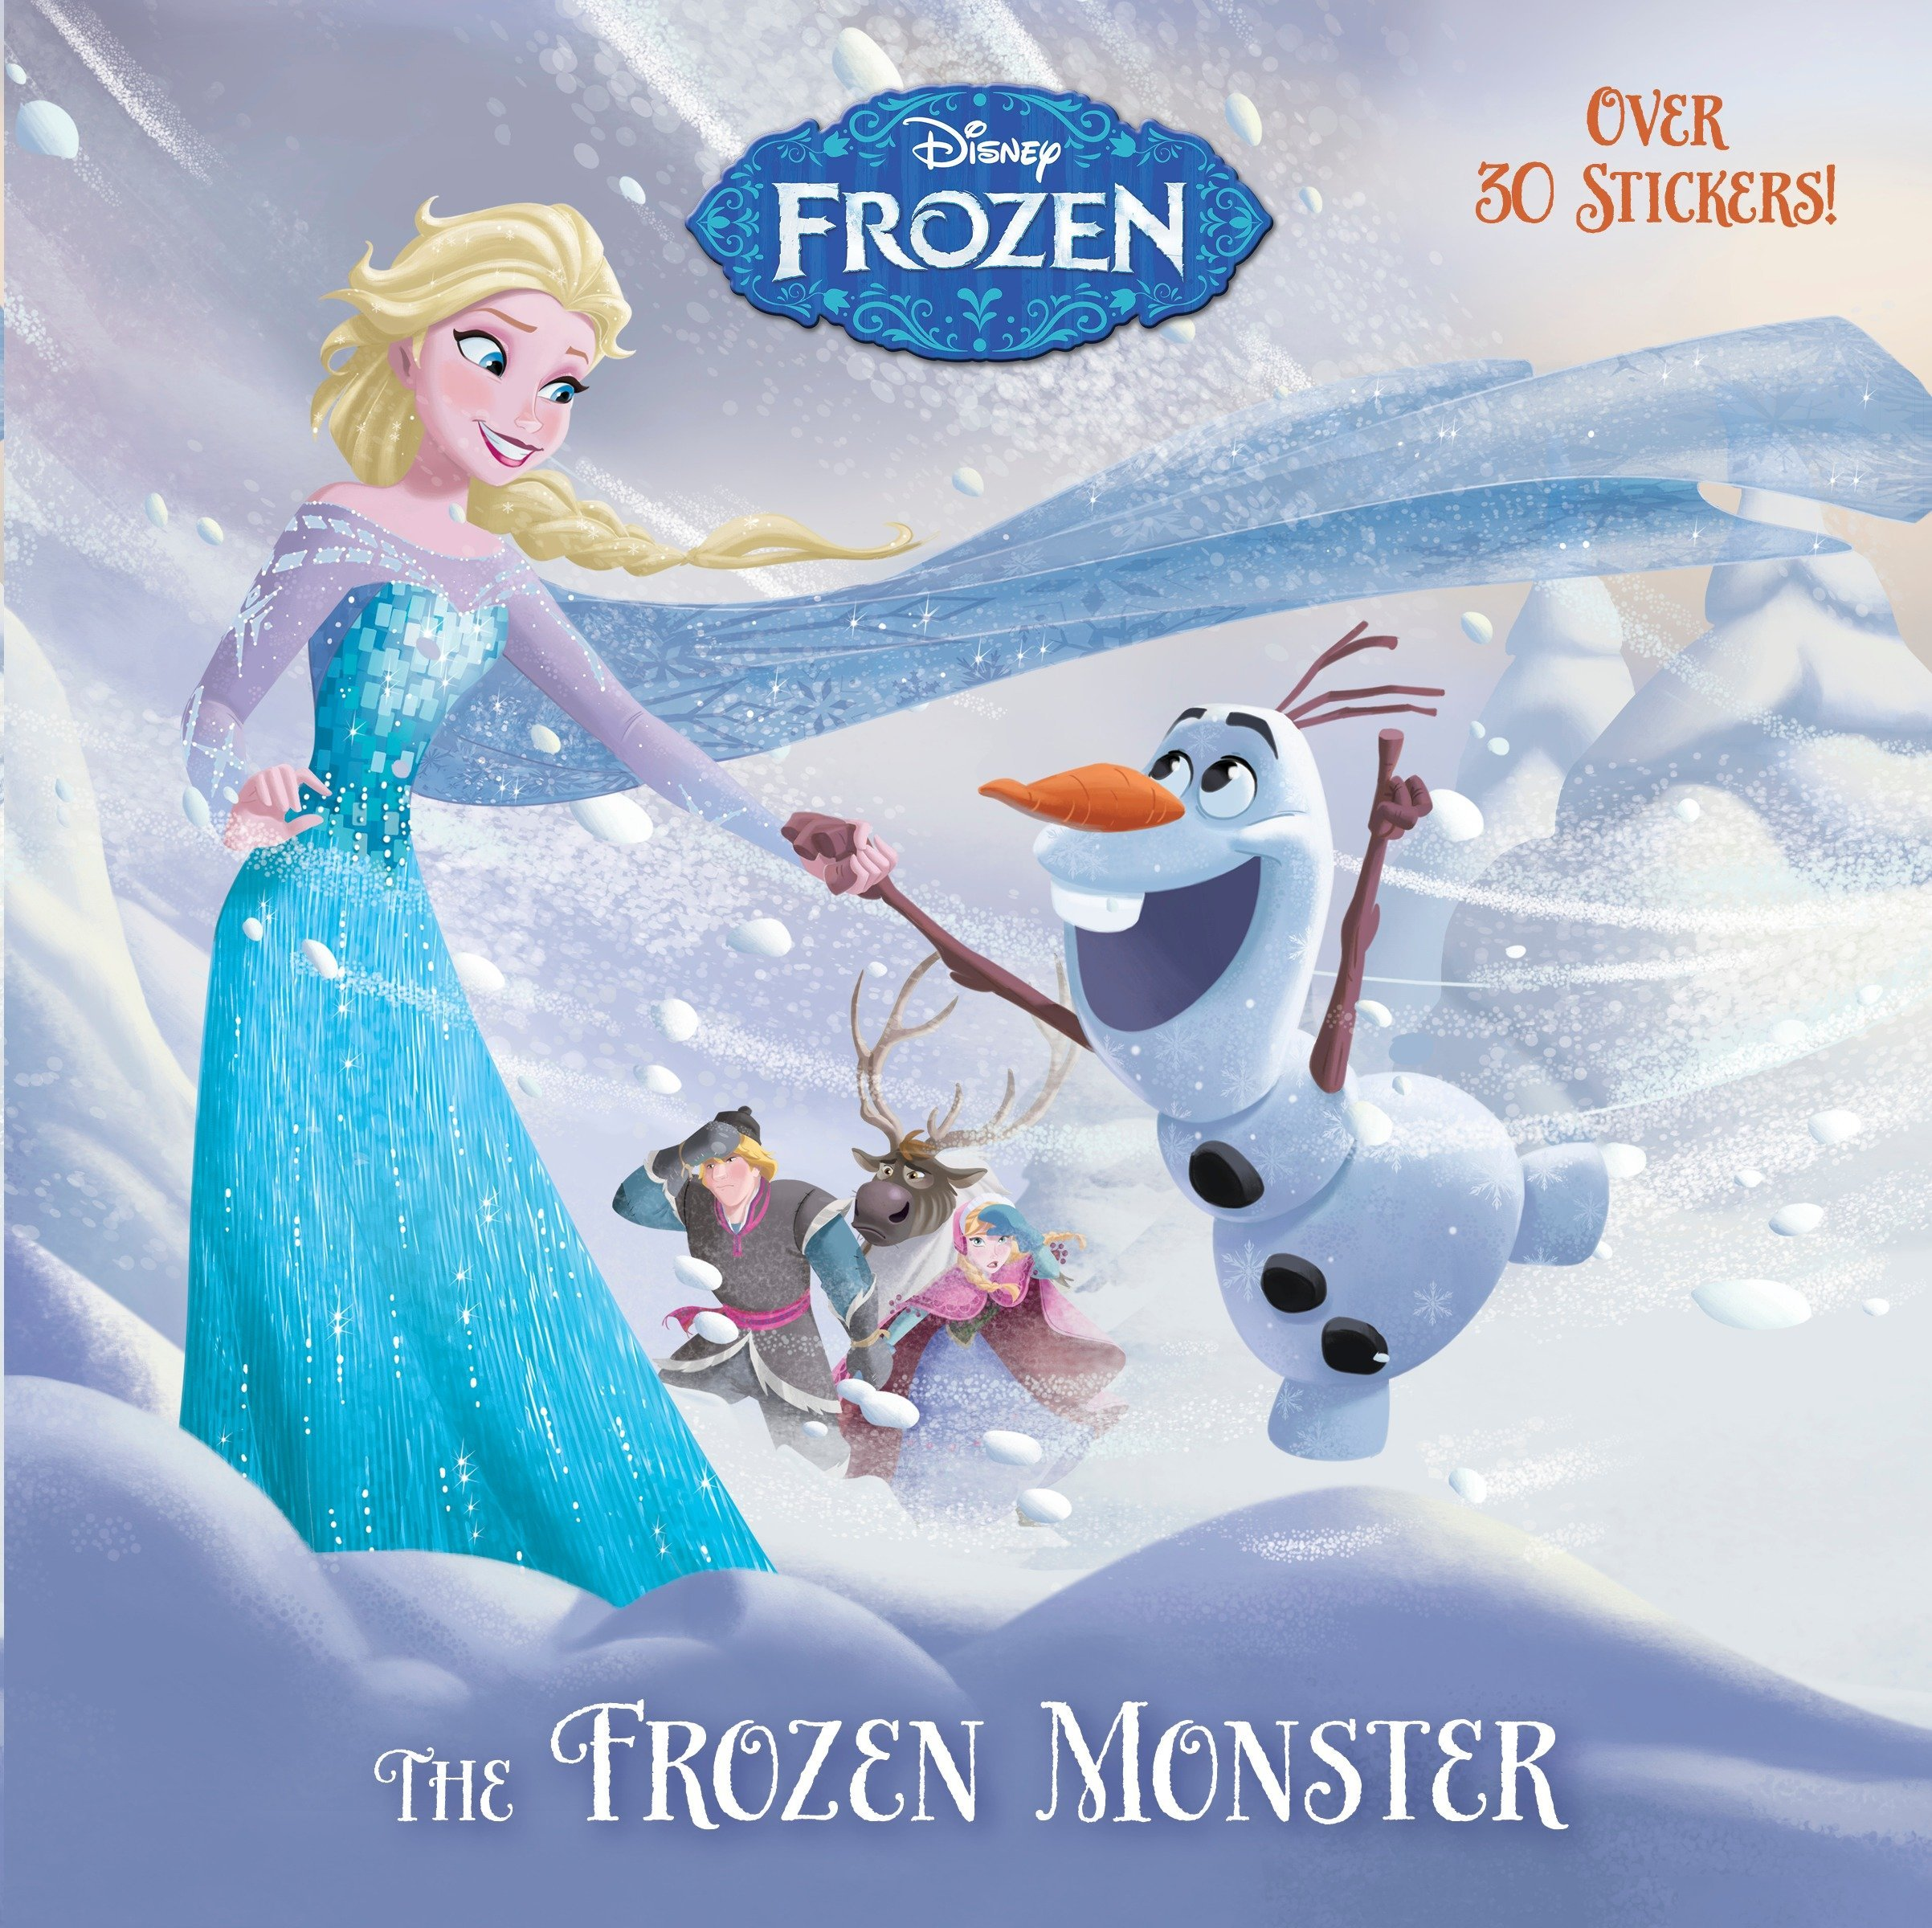 Posters Frozen Walt Disney Movie Promo Poster Anna Elsa Sven Kristoff No.2 Consumers First Entertainment Memorabilia